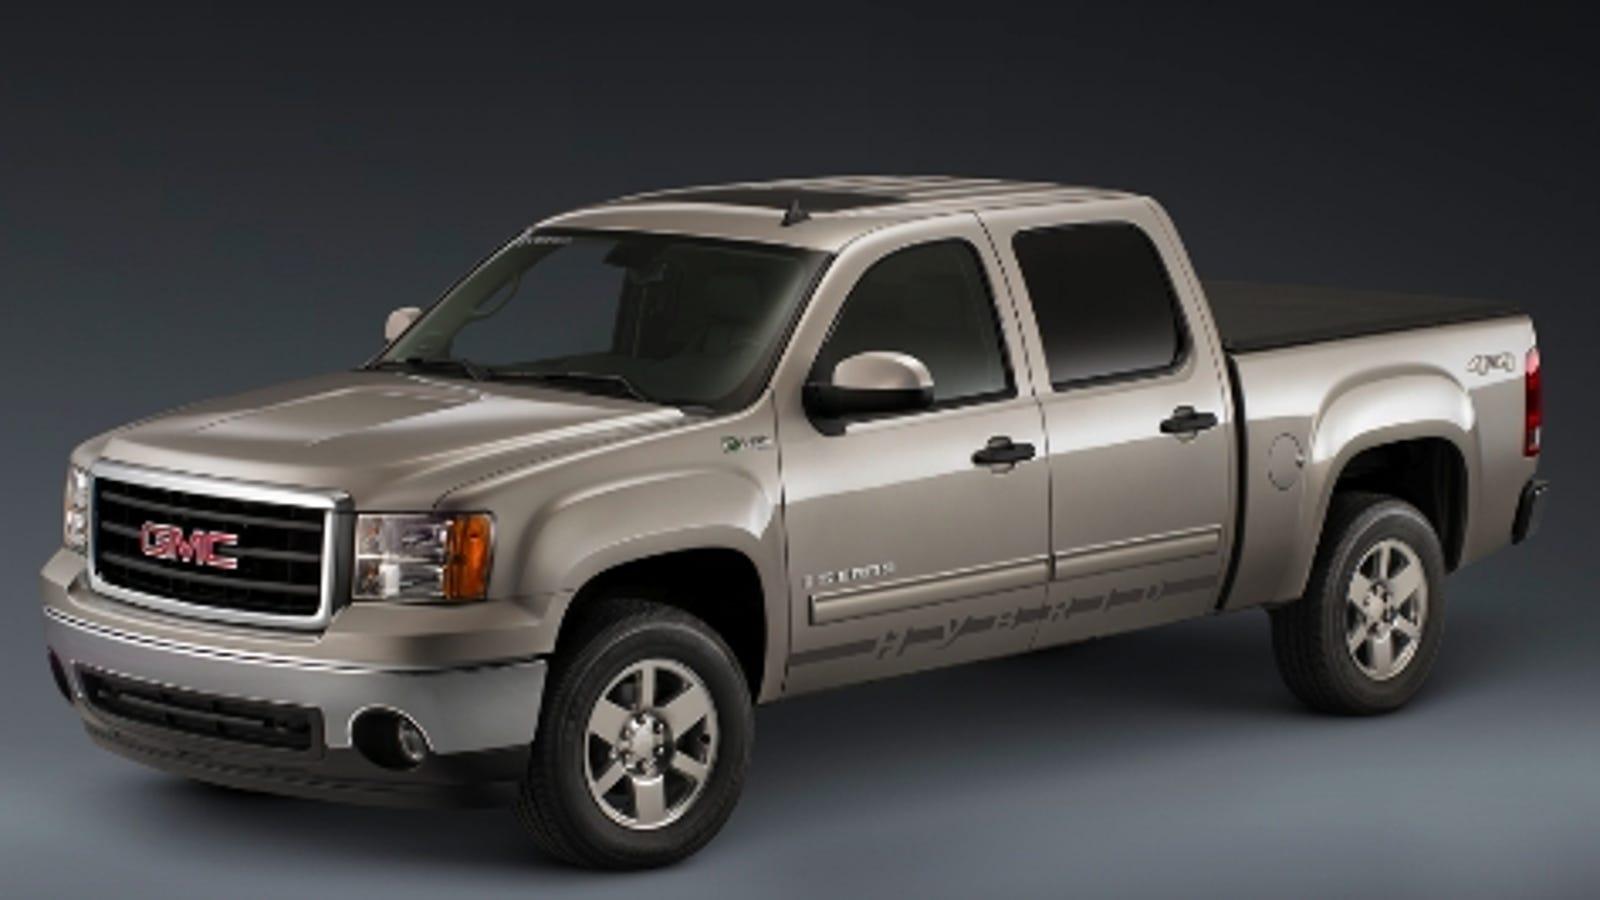 2009 GMC Sierra Hybrid Revealed Ahead of Chicago Auto Show